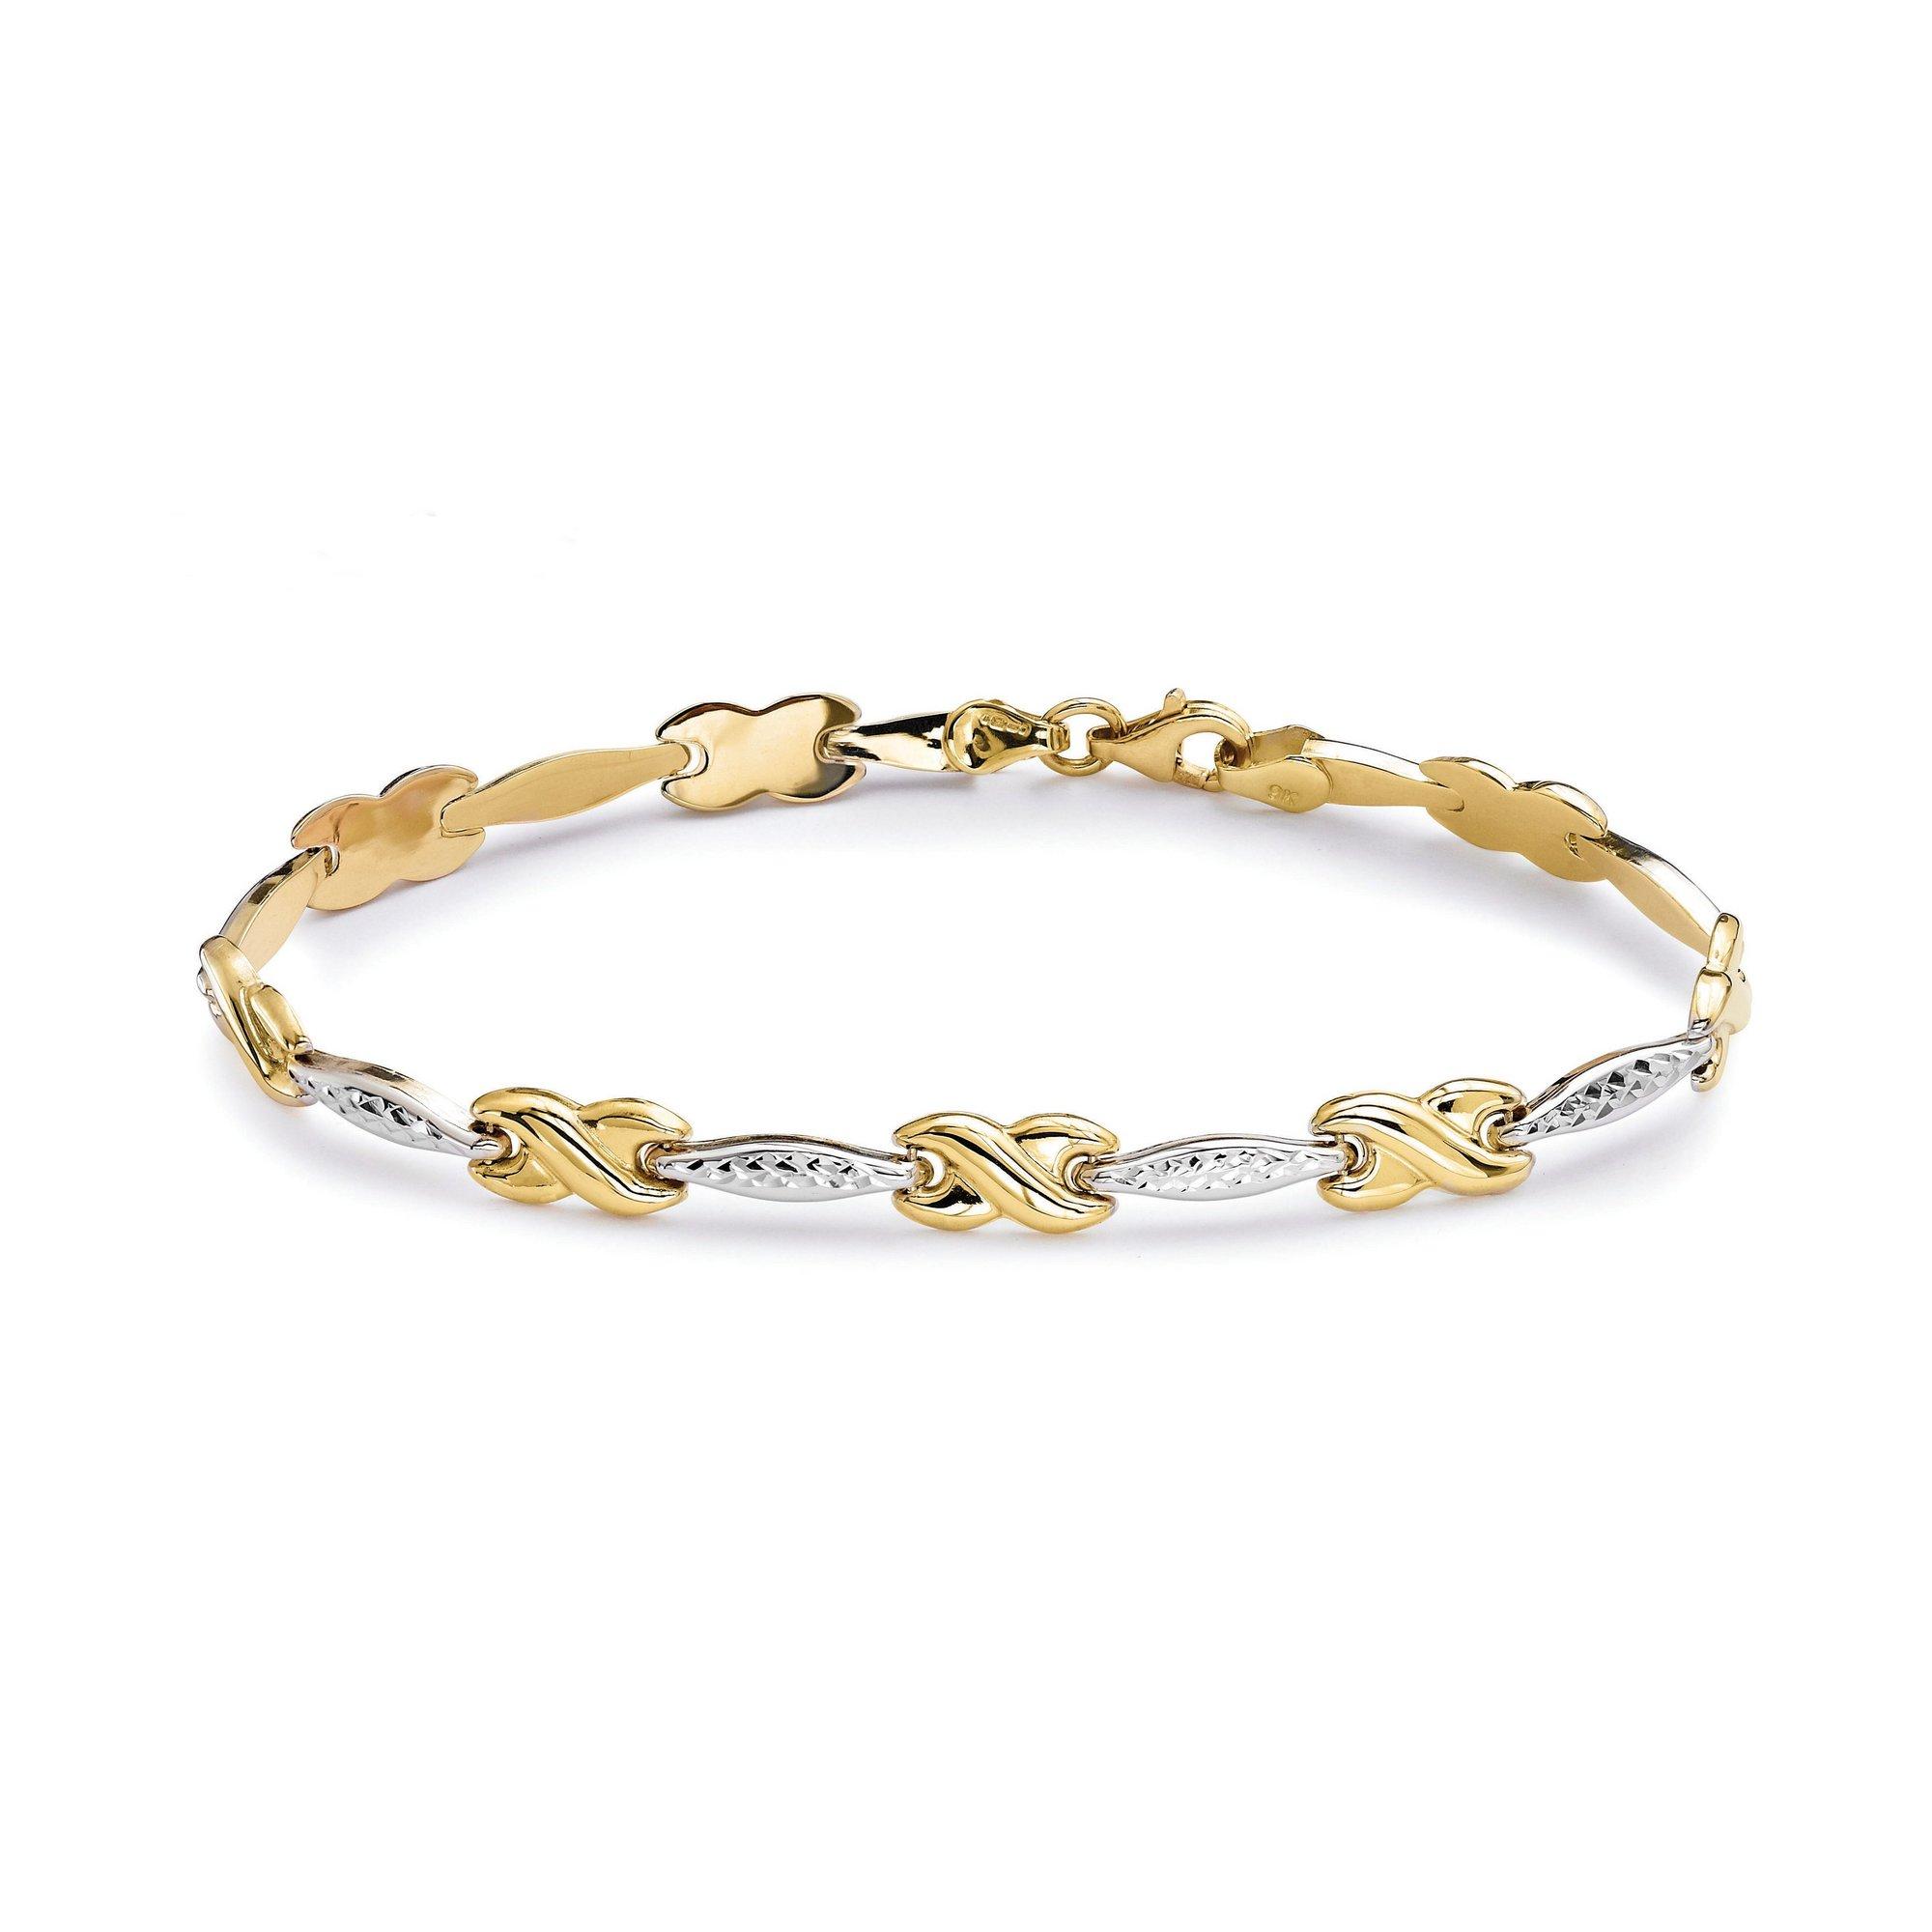 Image of 9ct Gold 2 Tone Kiss Bracelet